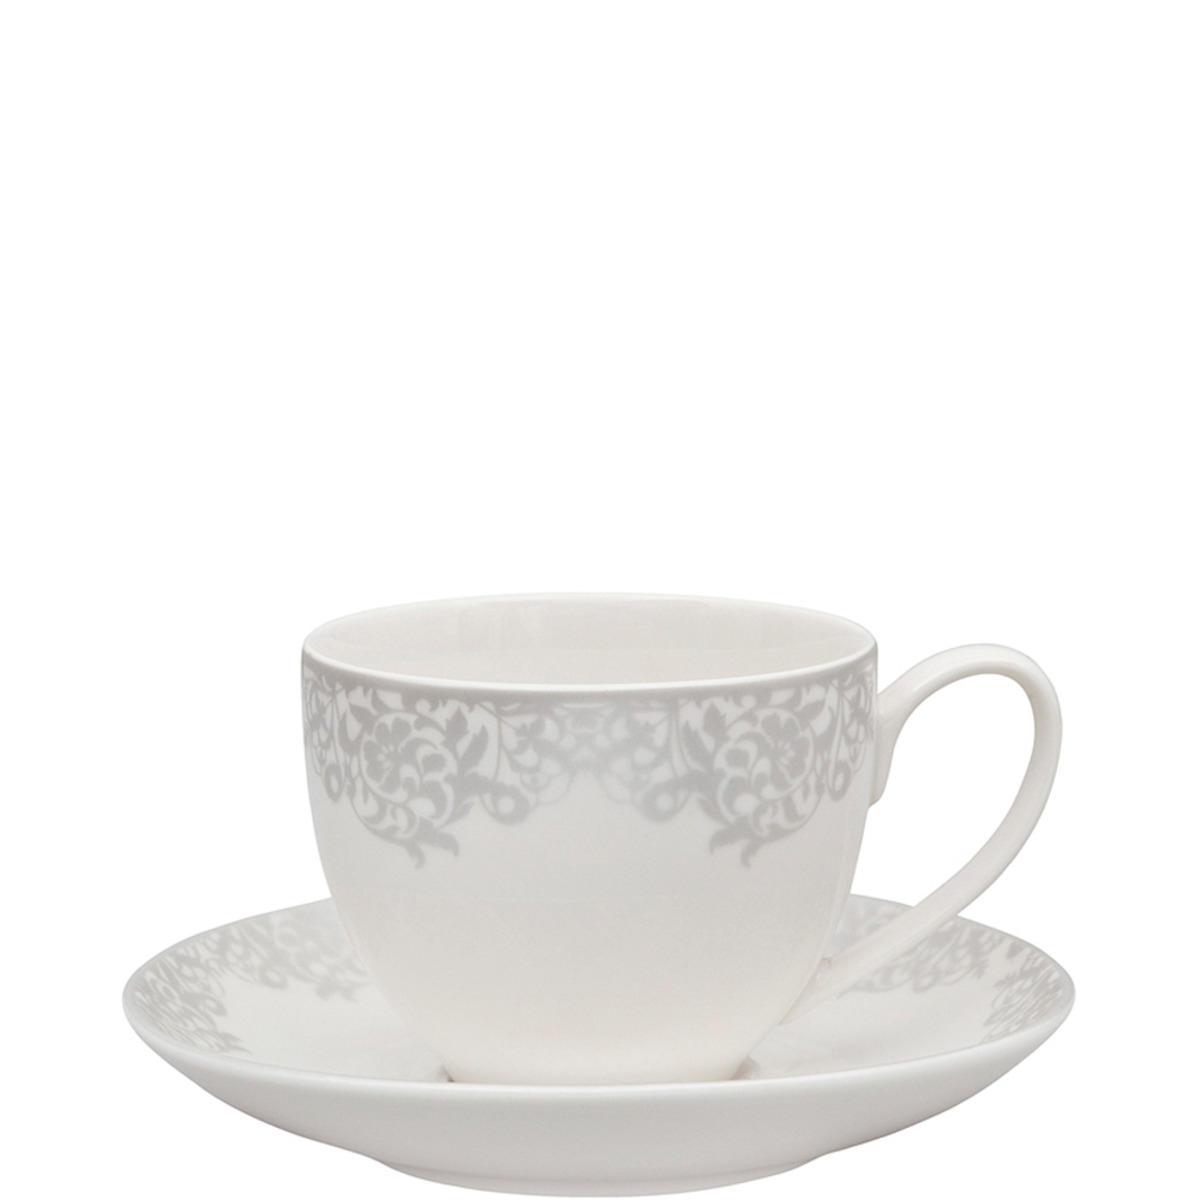 120709786: Monsoon Filigree Silver Tea Cup